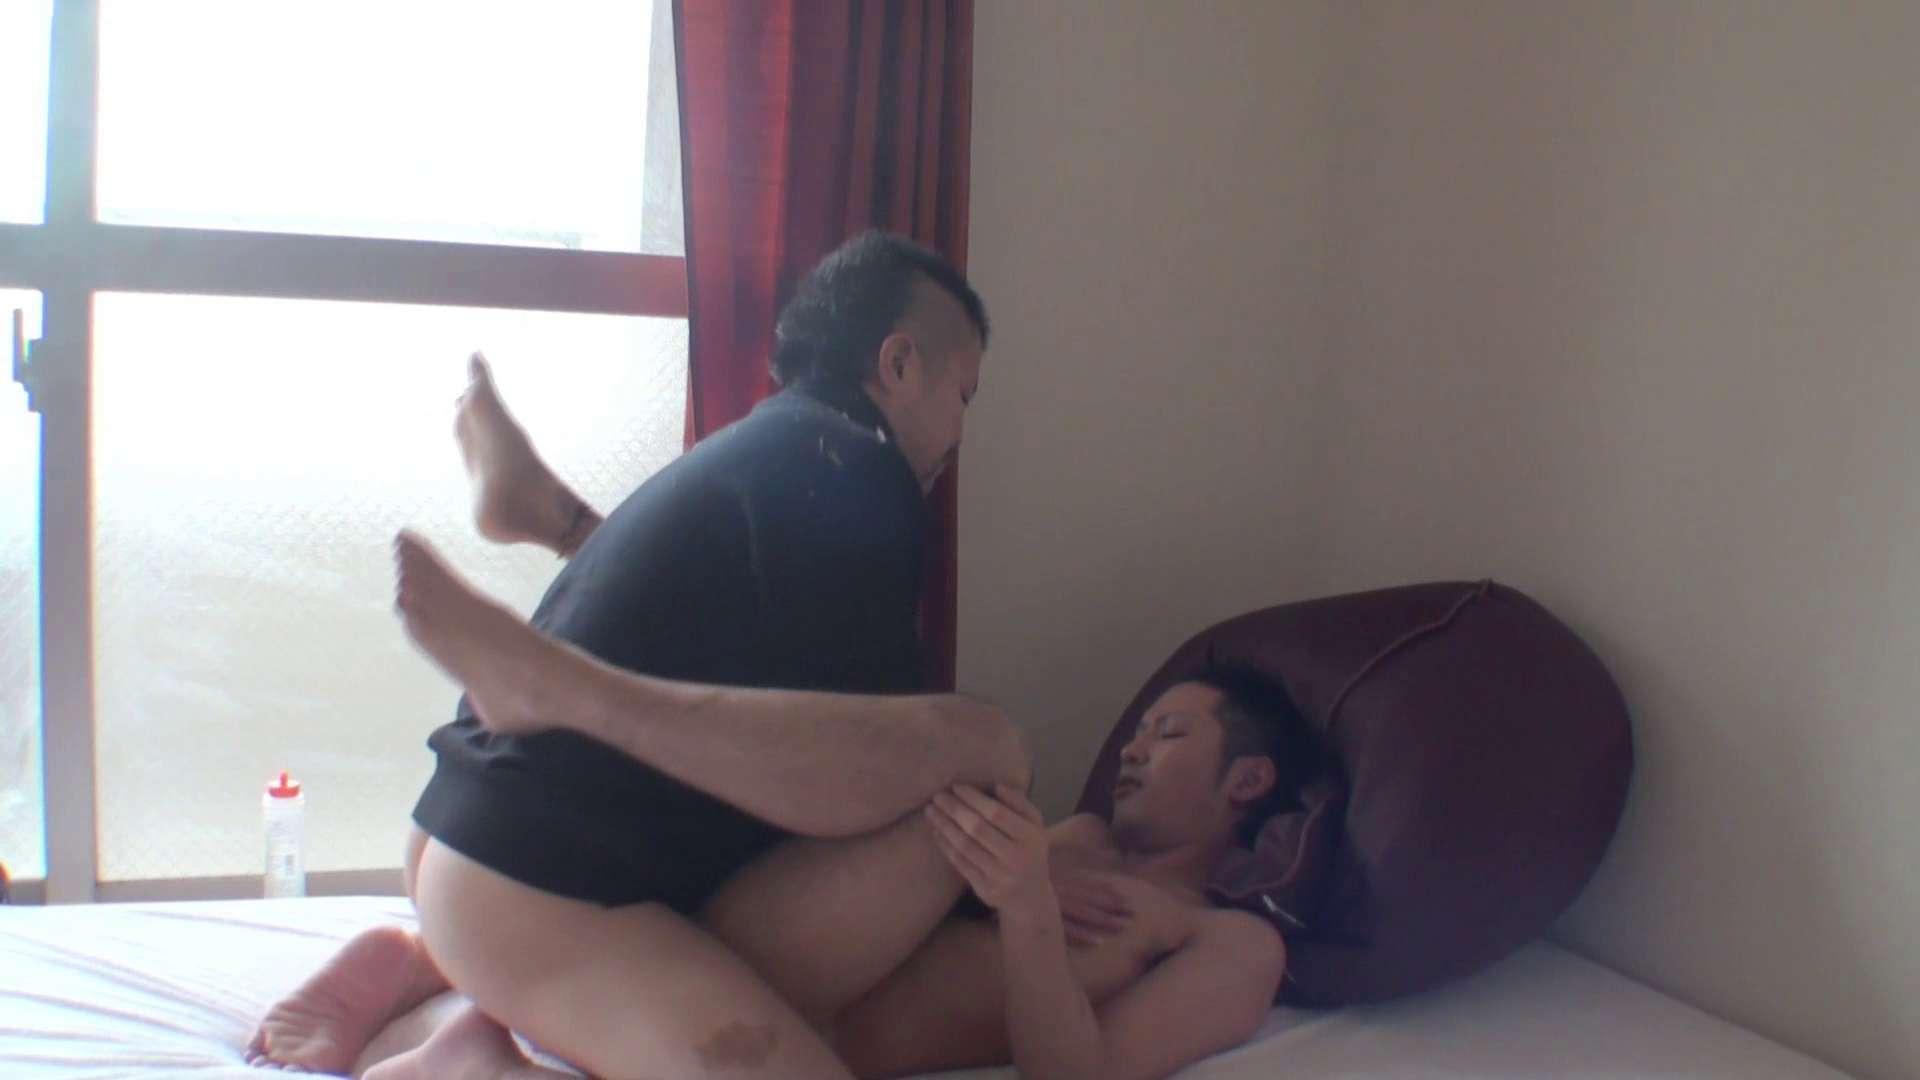 HD 良太と健二当たり前の日常 セックス編 サル系男子 ちんこ画像 65枚 47